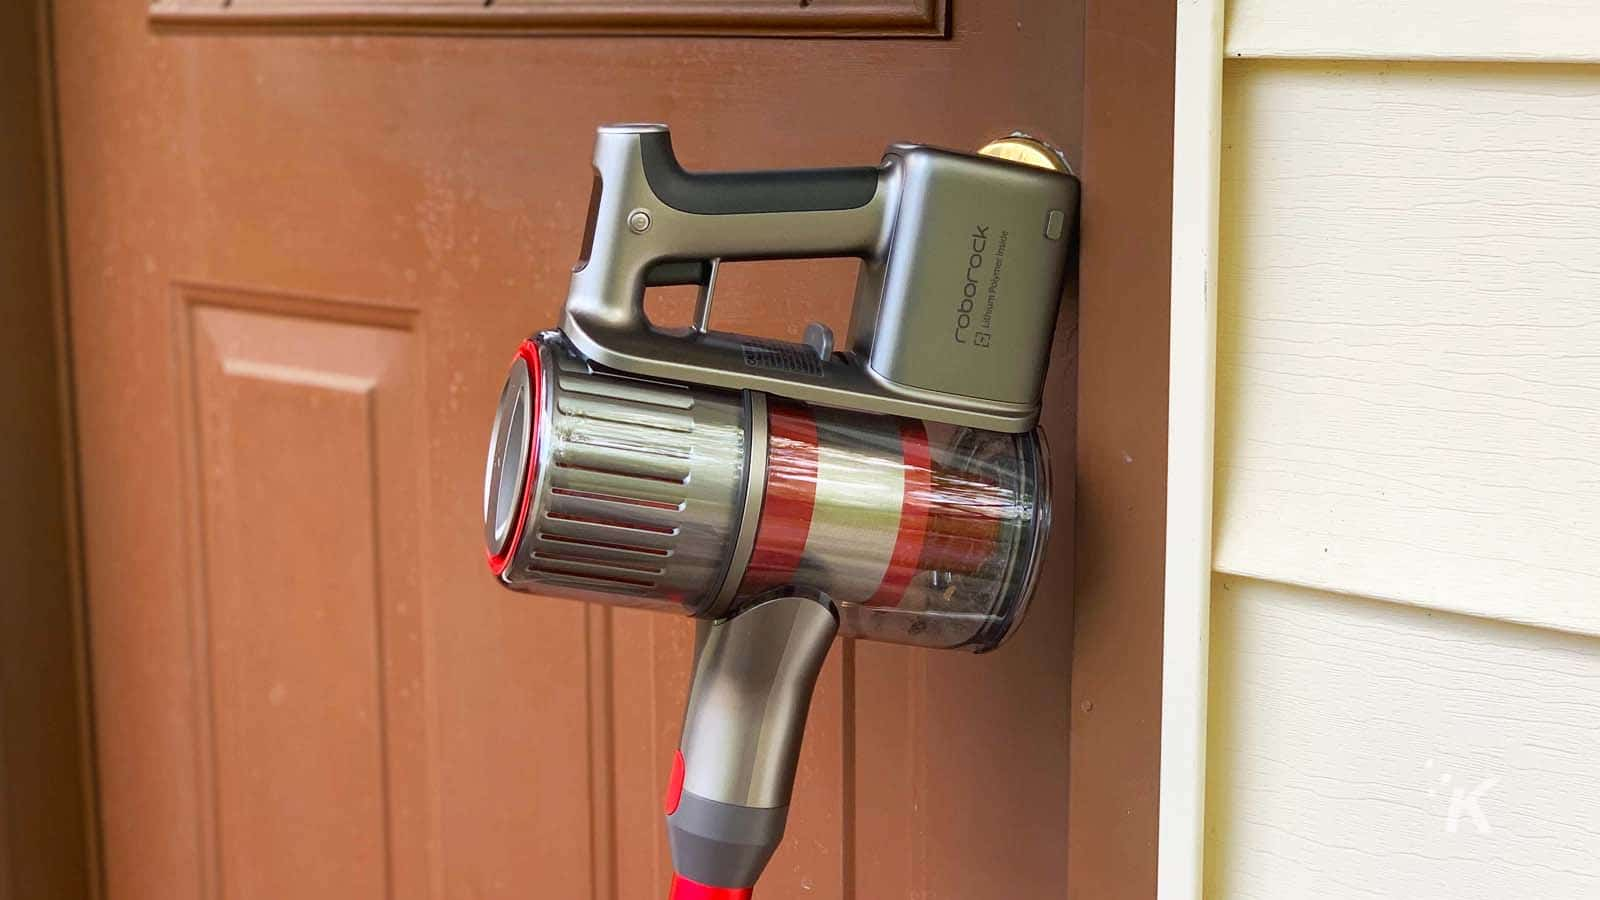 roborock h6 cordless vacuum